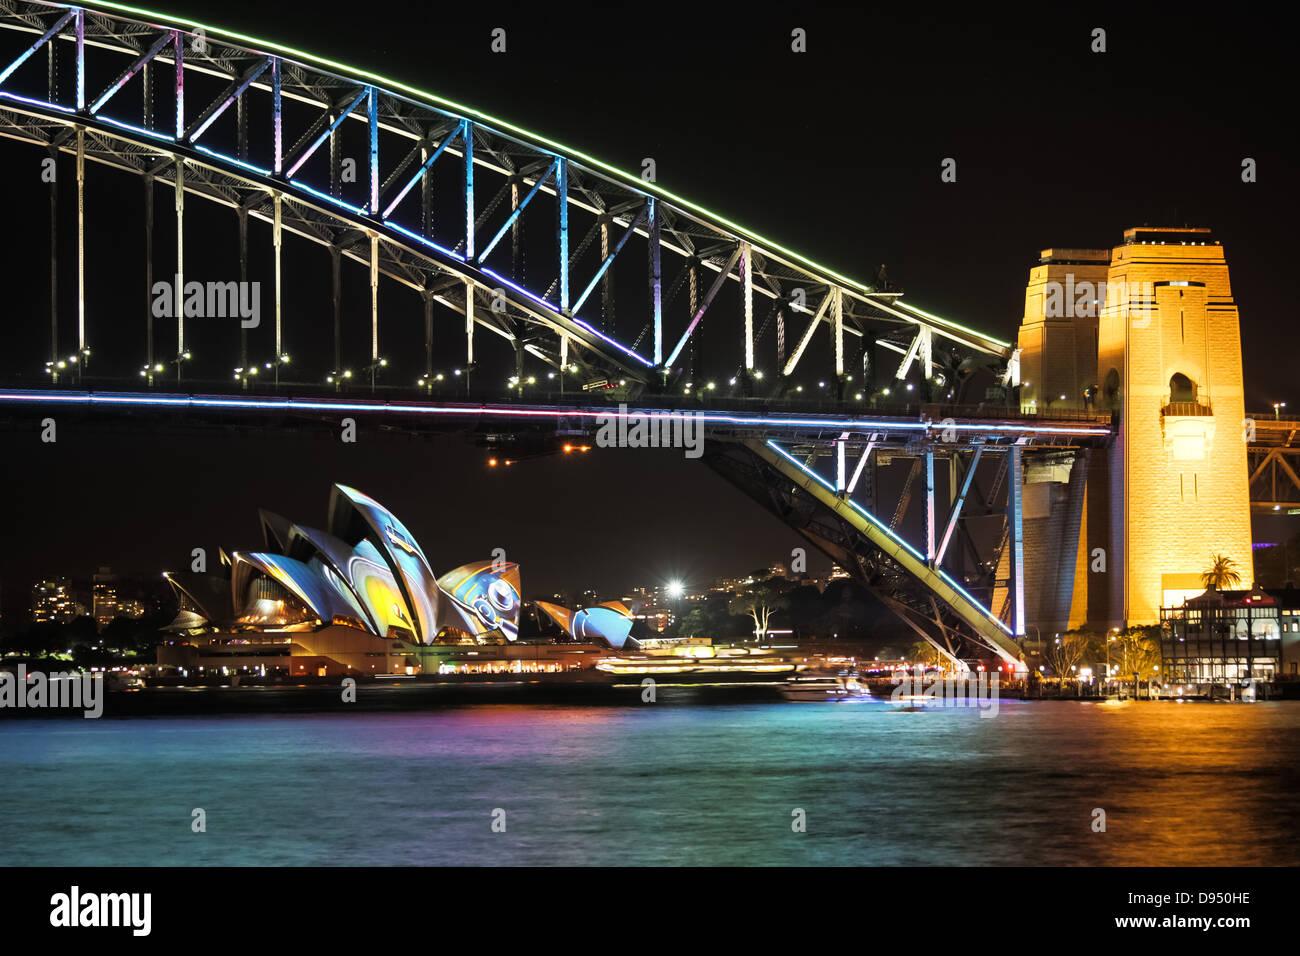 Sydney opera house and harbour bridge - Stock Photo Sydney Harbour Bridge And Sydney Opera House At Night During The Annual Sydney Lighting Festival Vivid